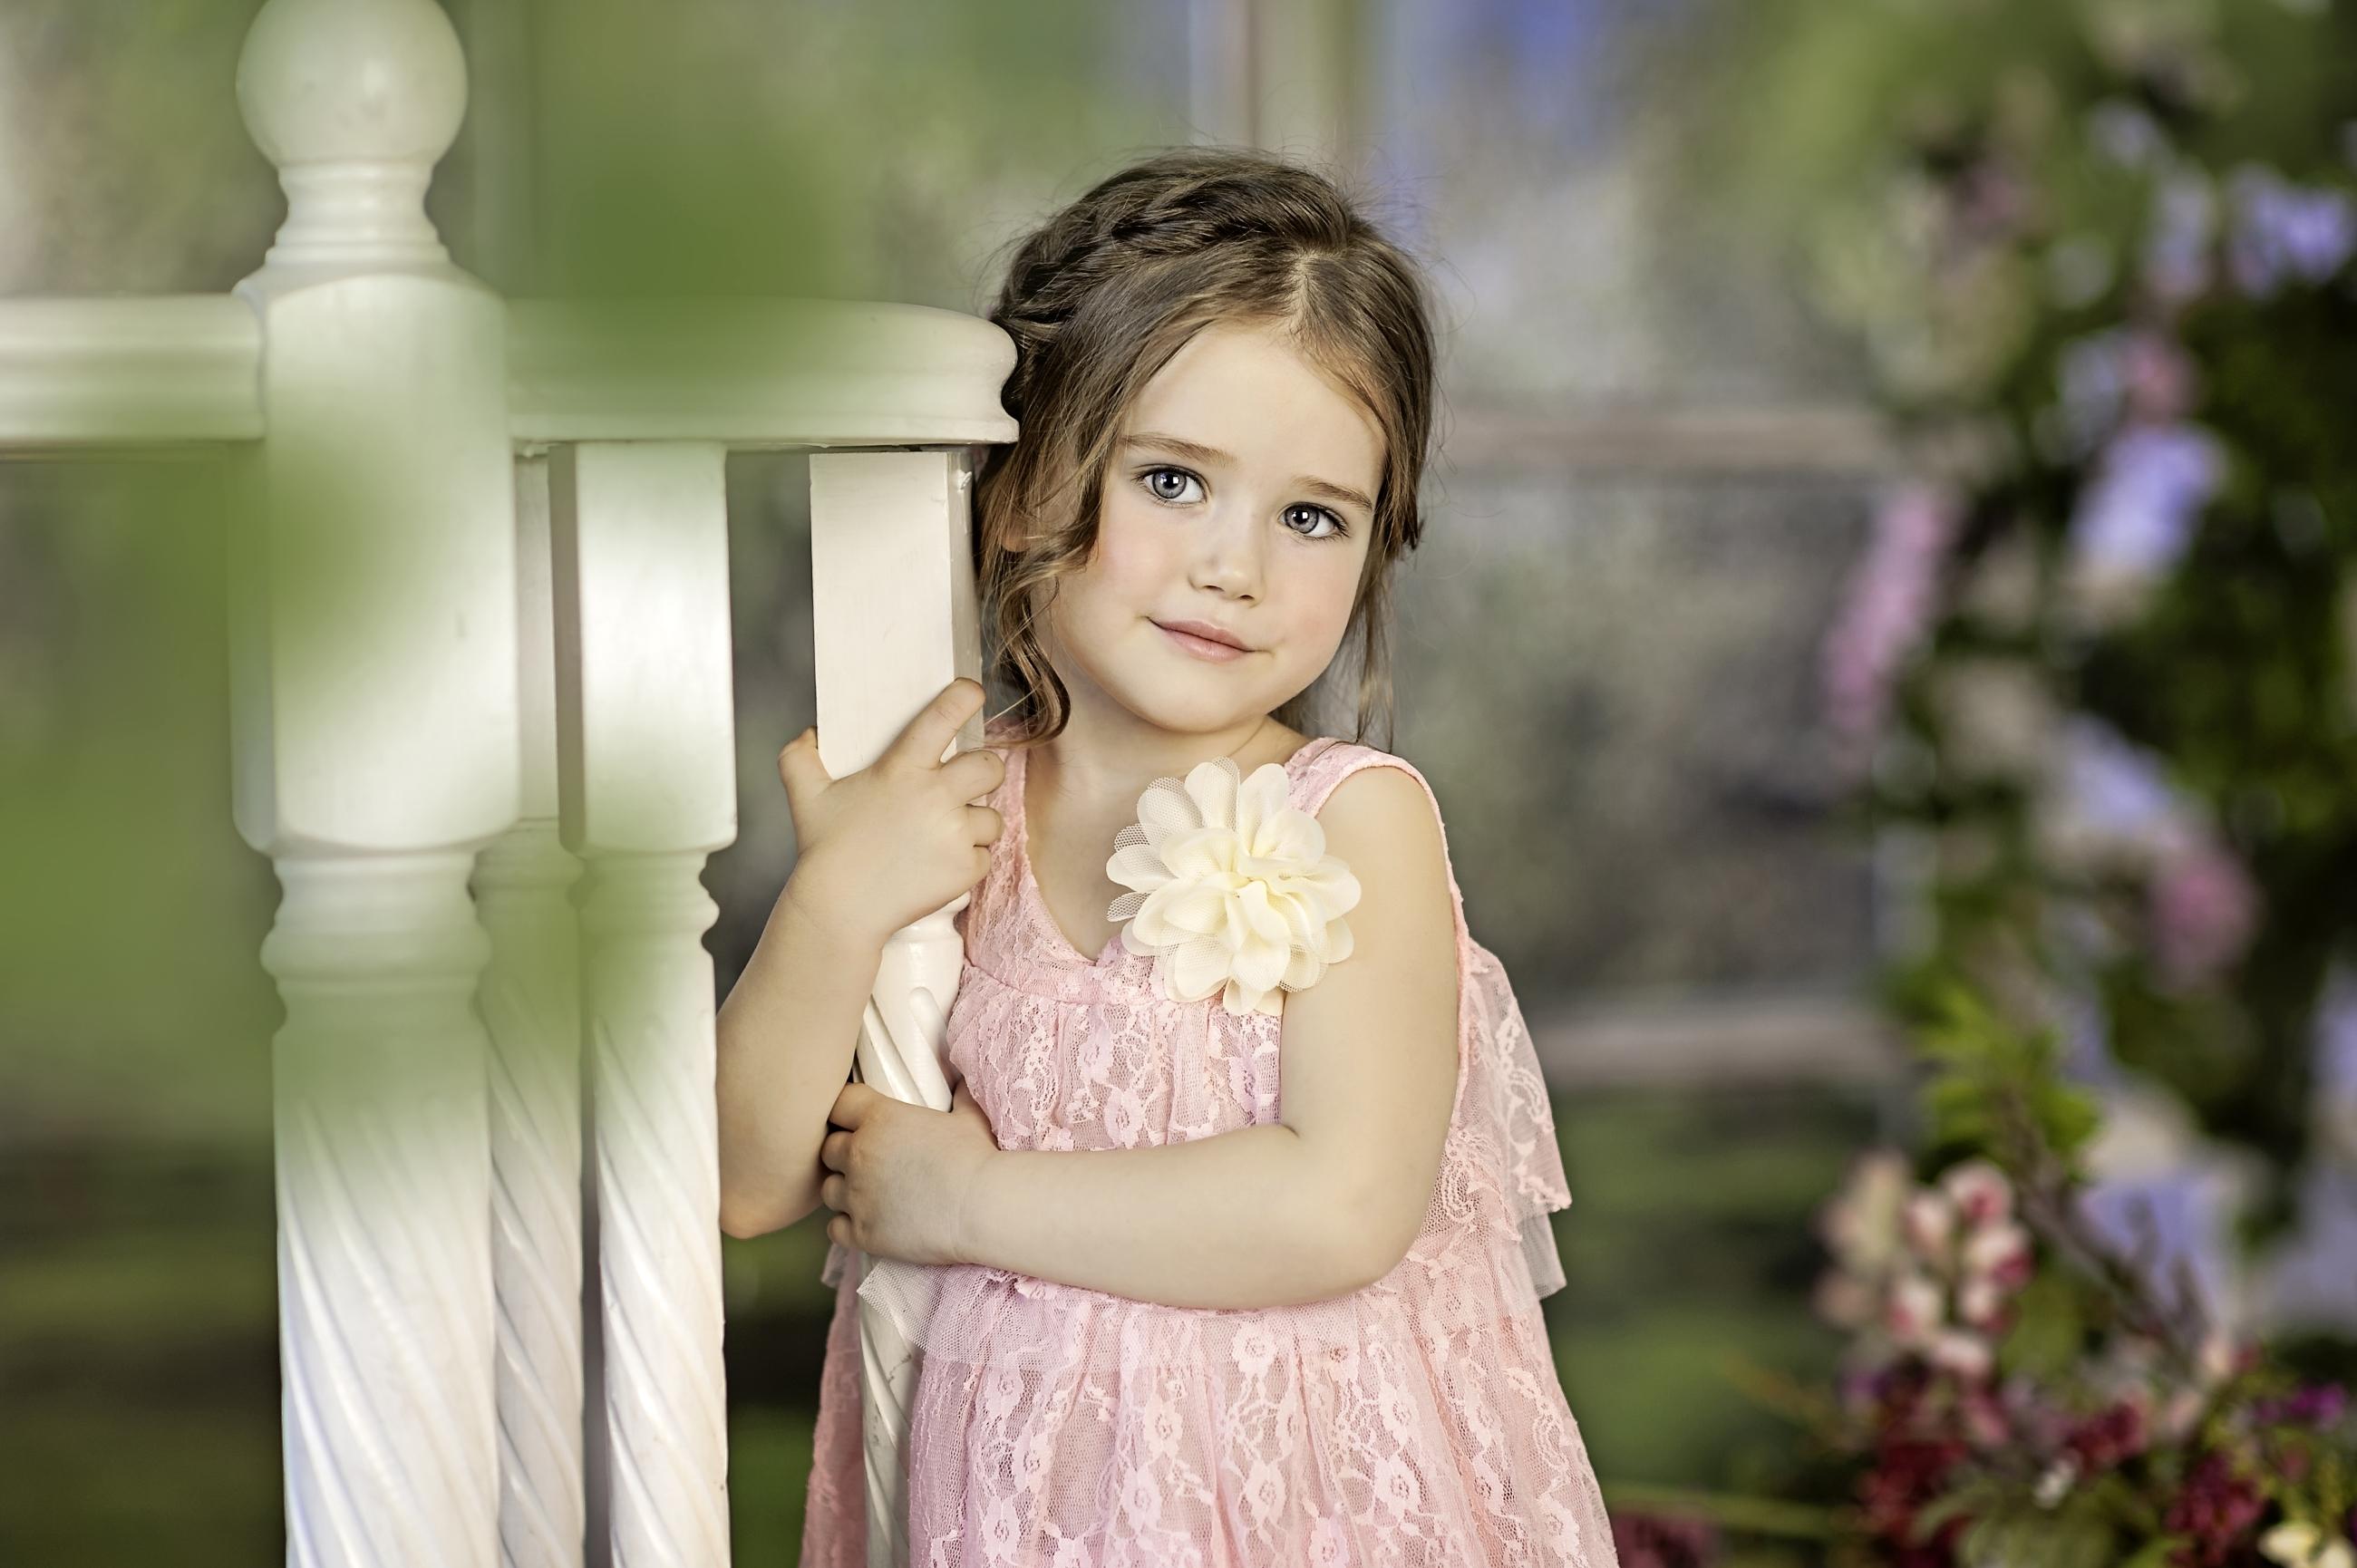 ребенок девочка  № 3563233 бесплатно